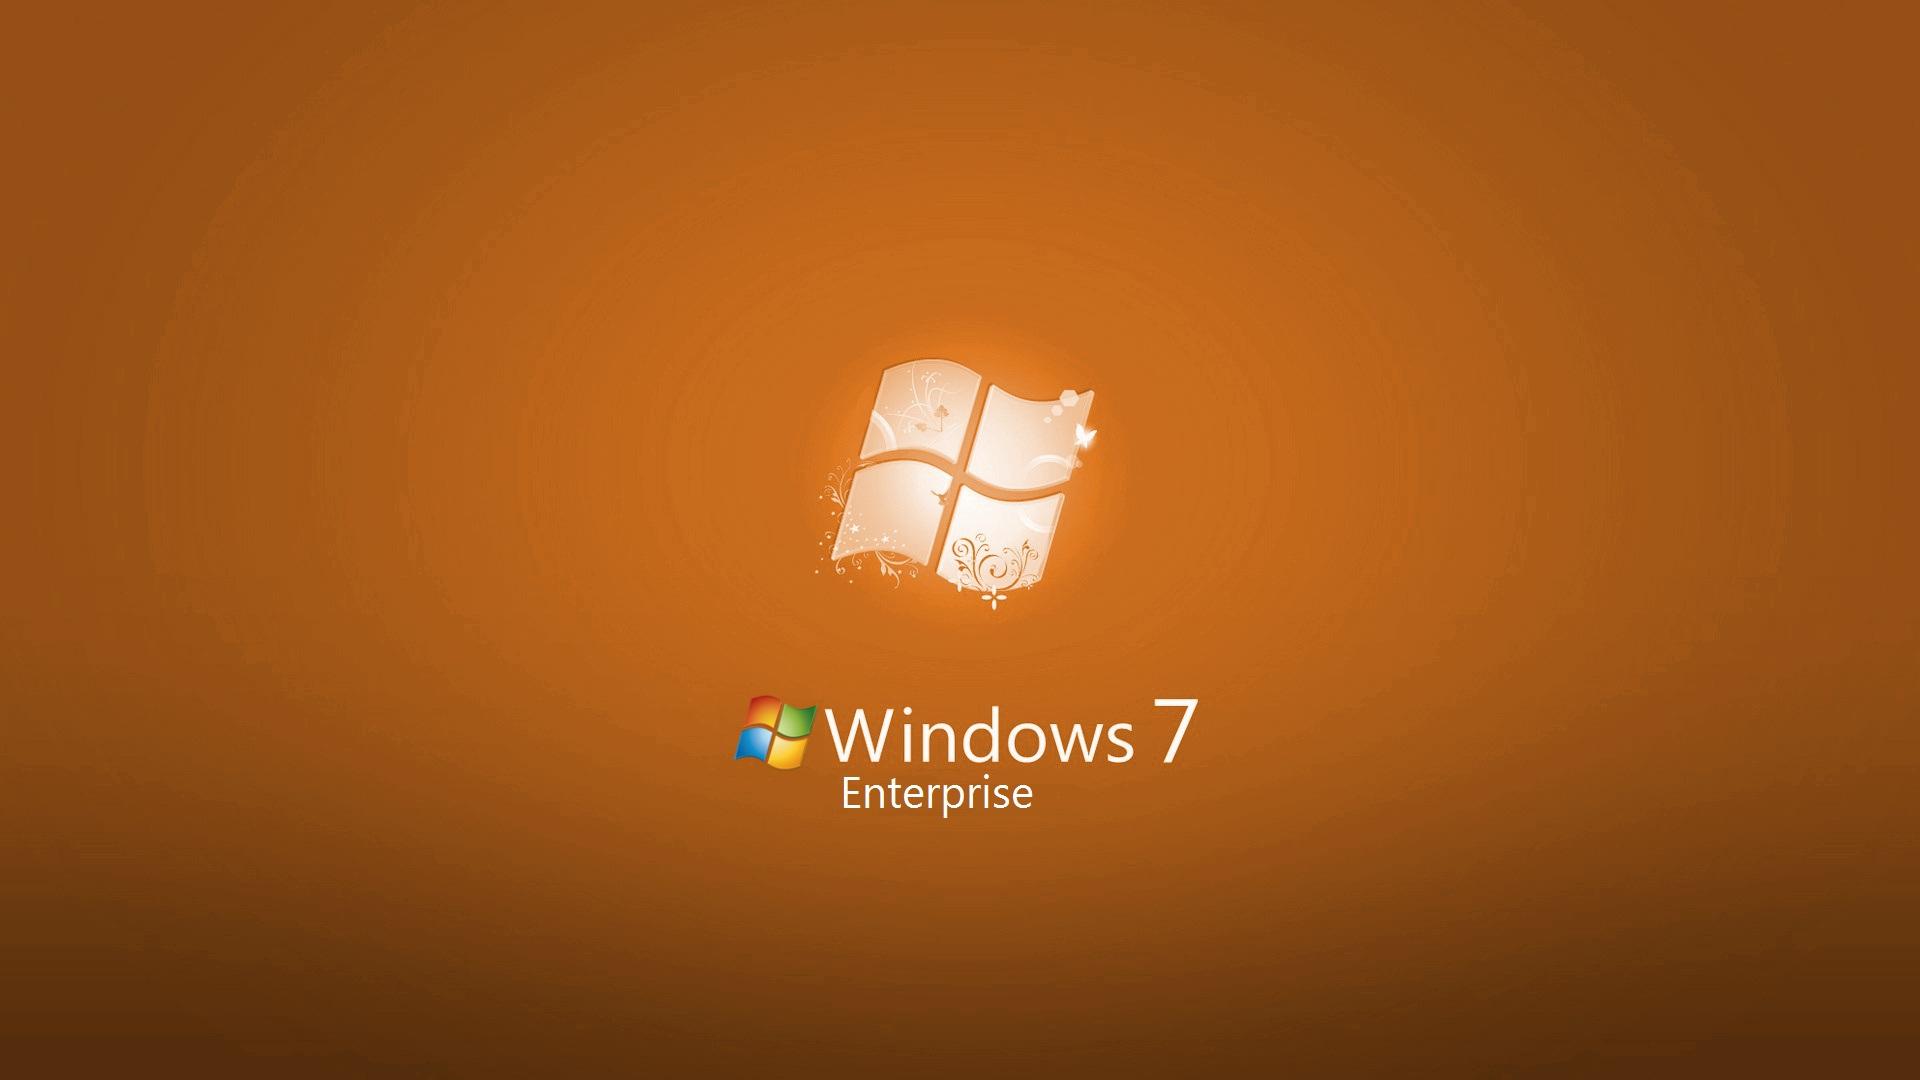 Windows 7 Enterprise Wallpaper 1920x1080 By Jwc59382 On Deviantart